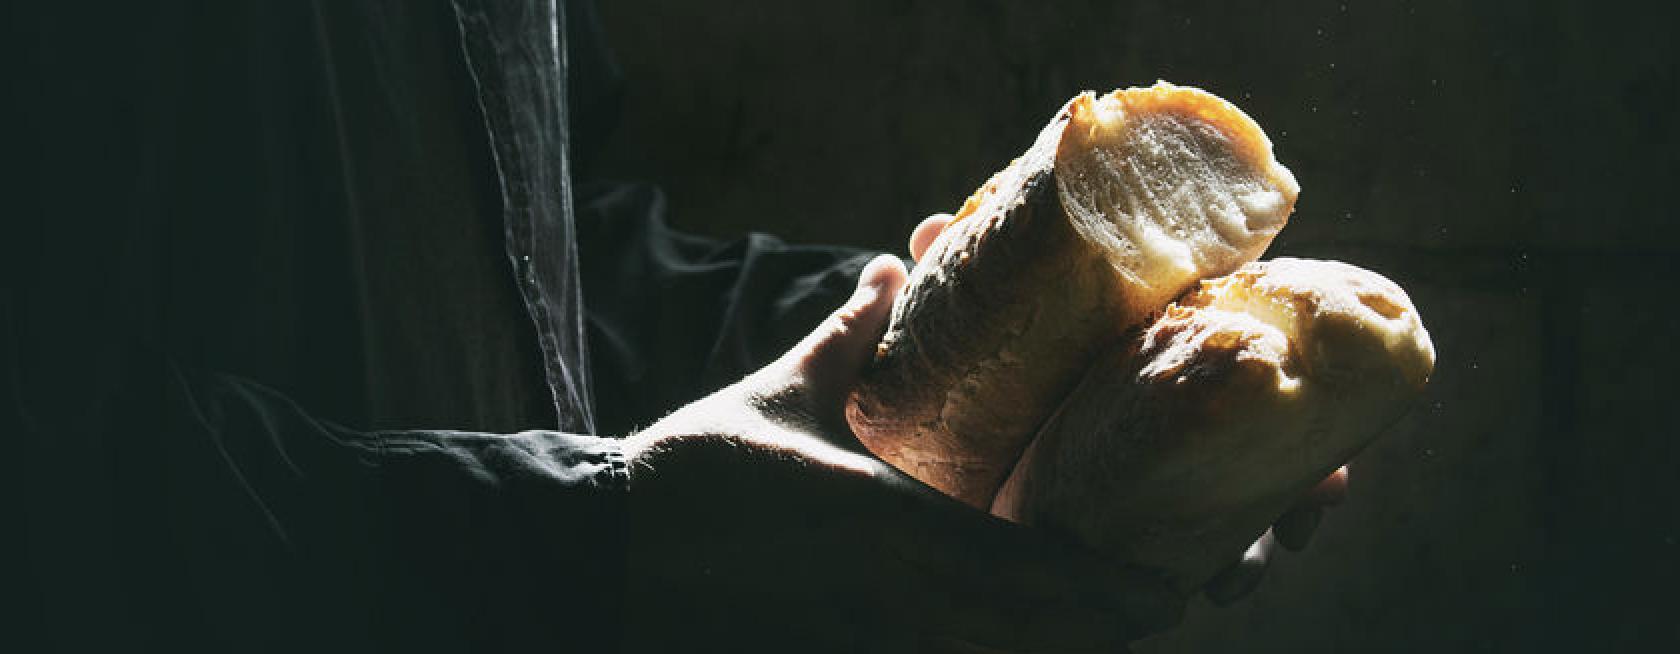 sharing bread, biblical fasting is sharing bread